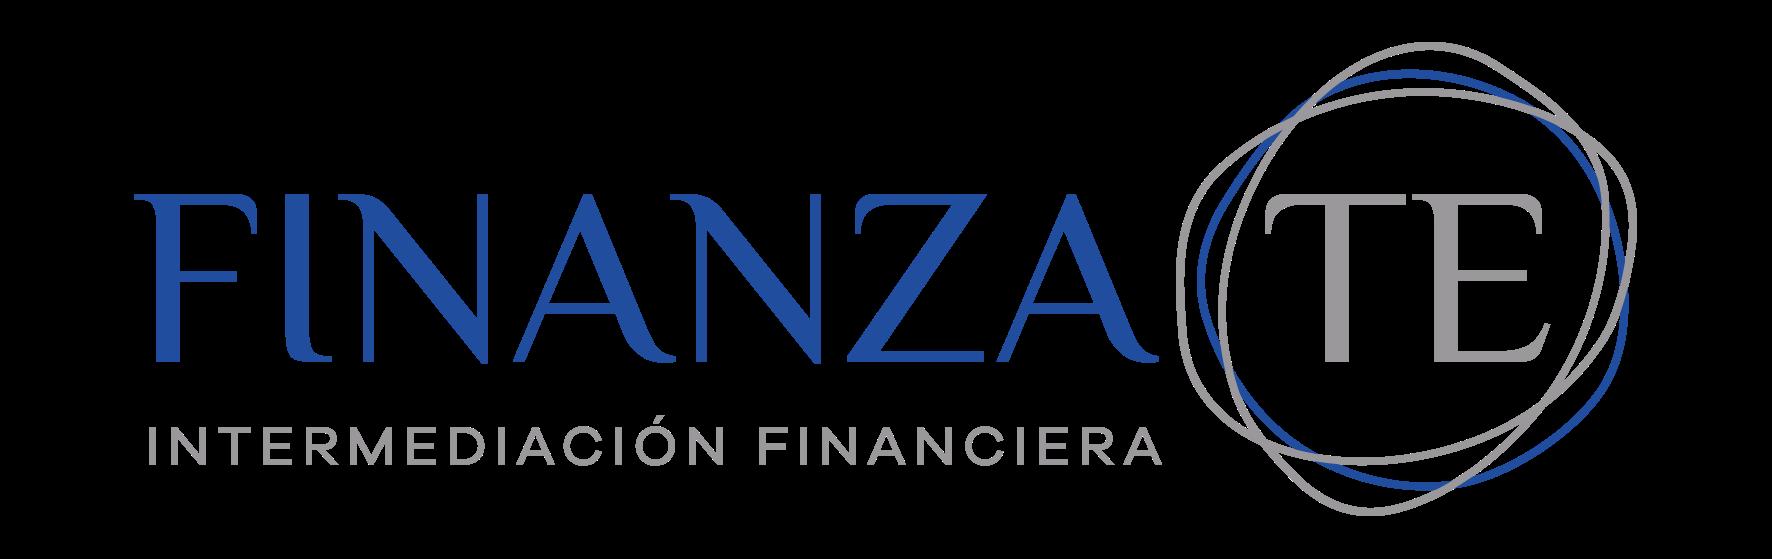 Finanzate